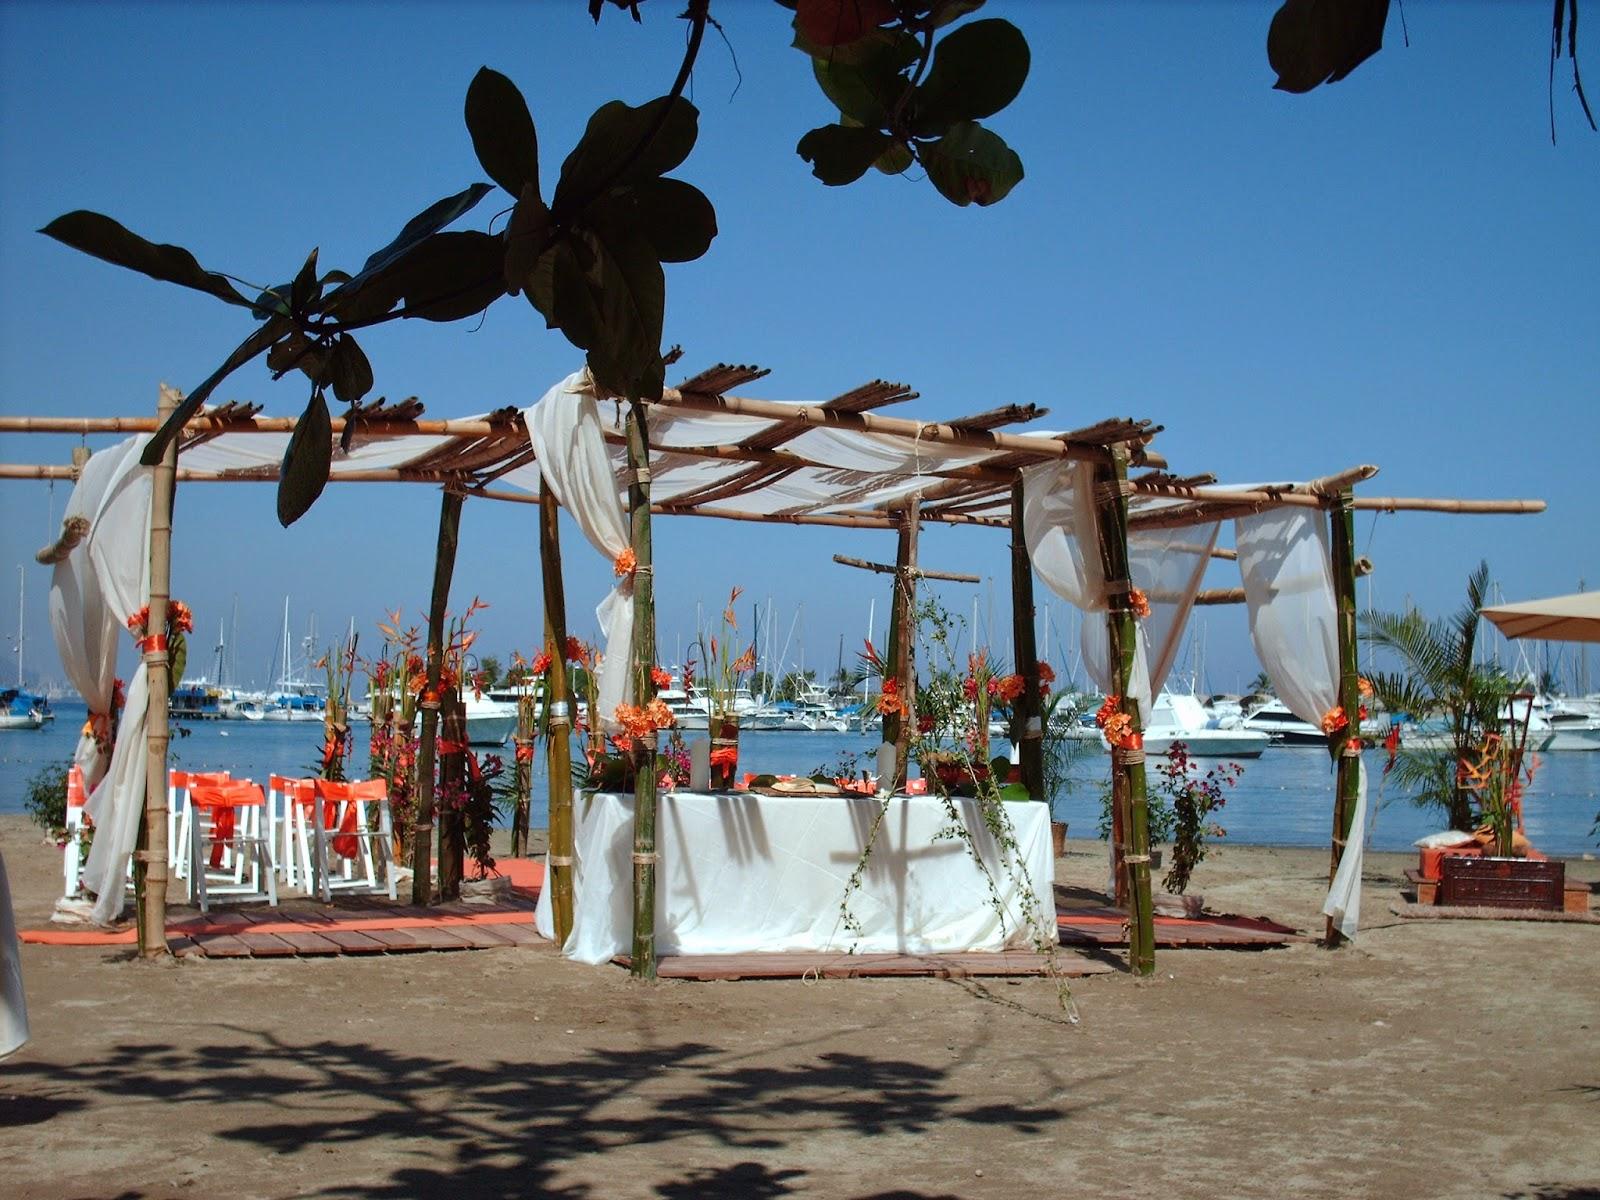 Best beach wedding locations in california